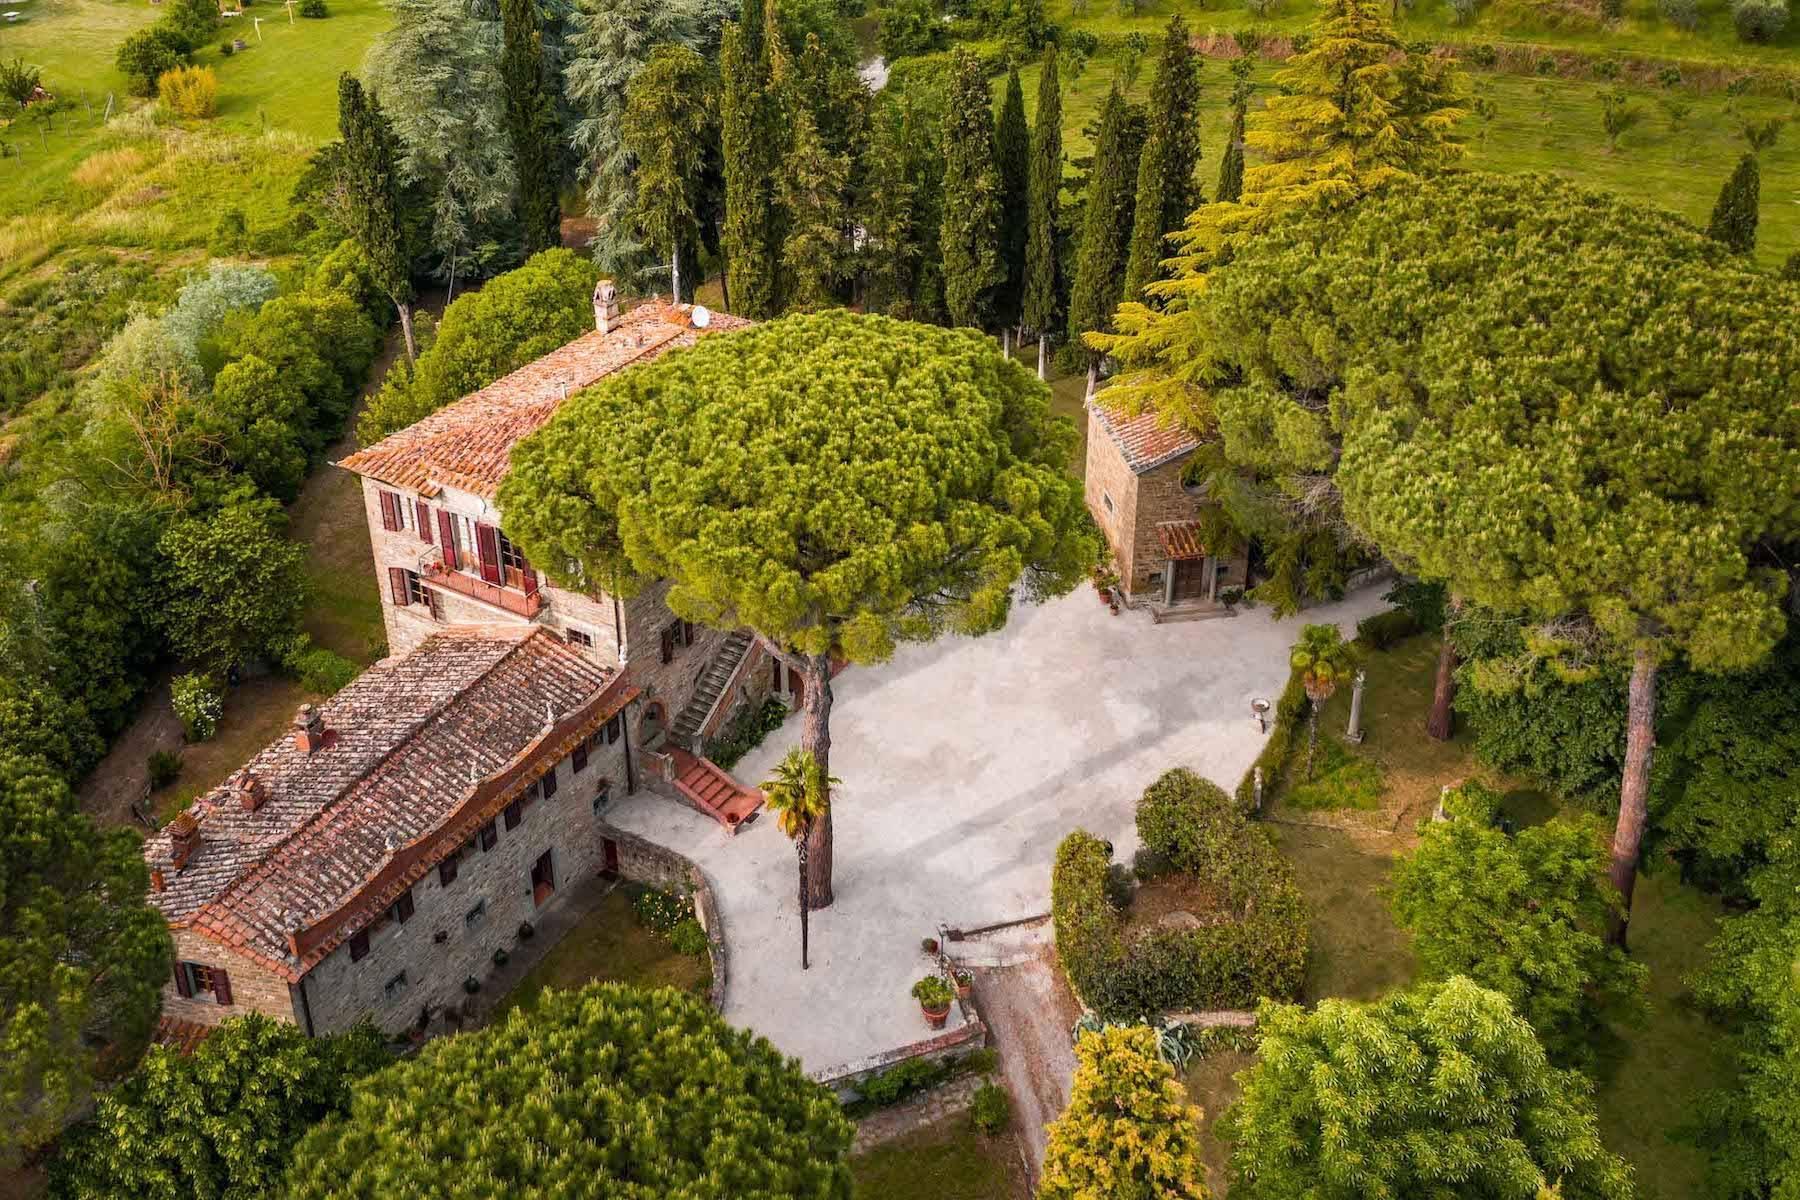 Historische Villa aus dem 1700 in Cortona - 2